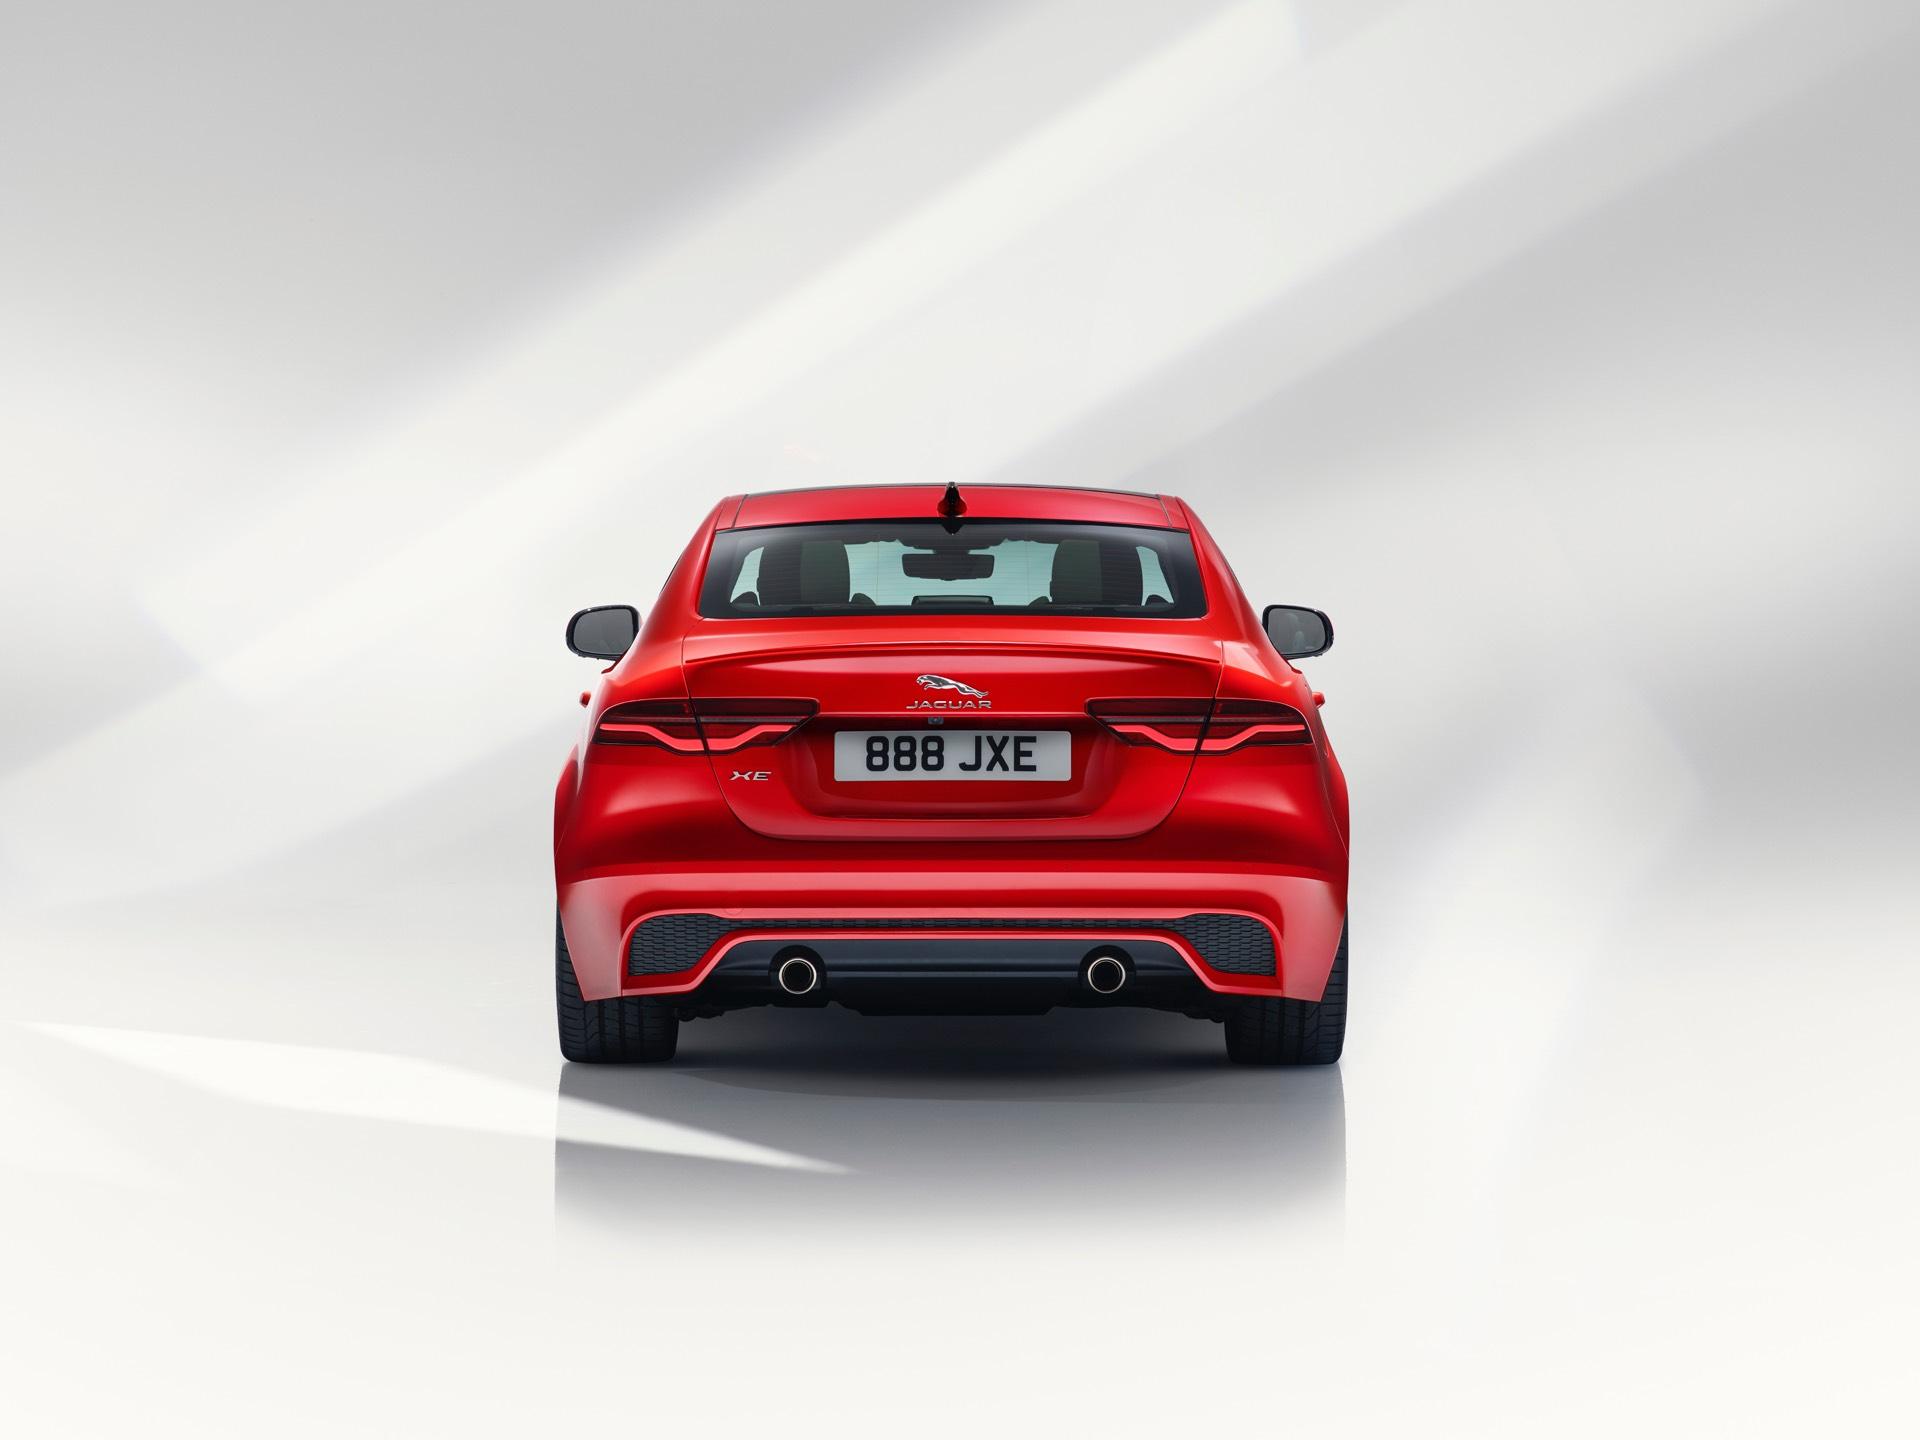 New Jaguar Xe Released In London With Updated Interior Gtspirit